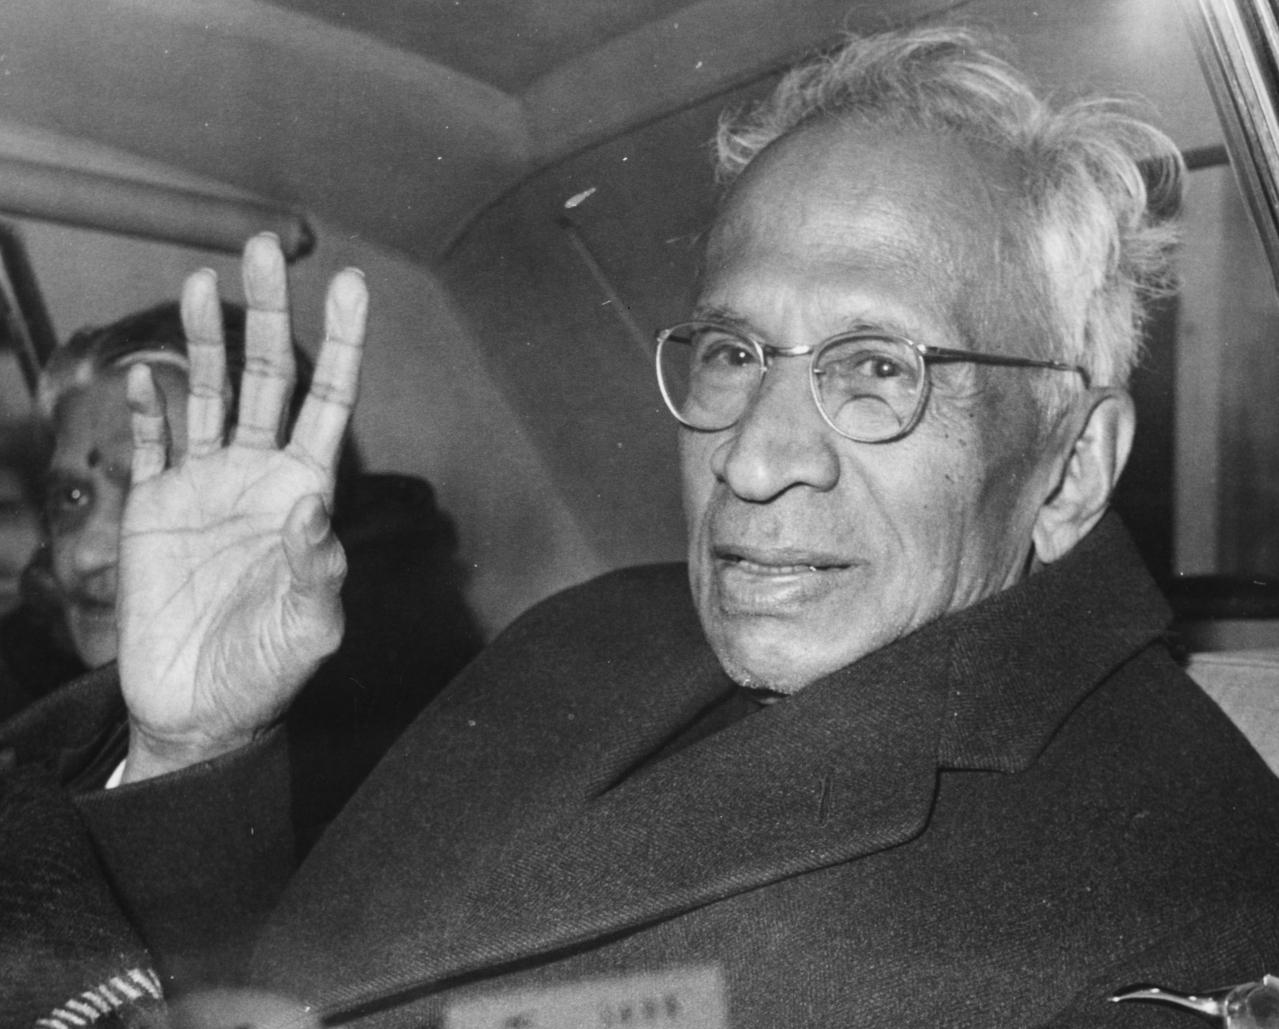 Dr Sarvepalli Radhakrishnan in London in 1965 (J. Wilds/Keystone/Getty Images)